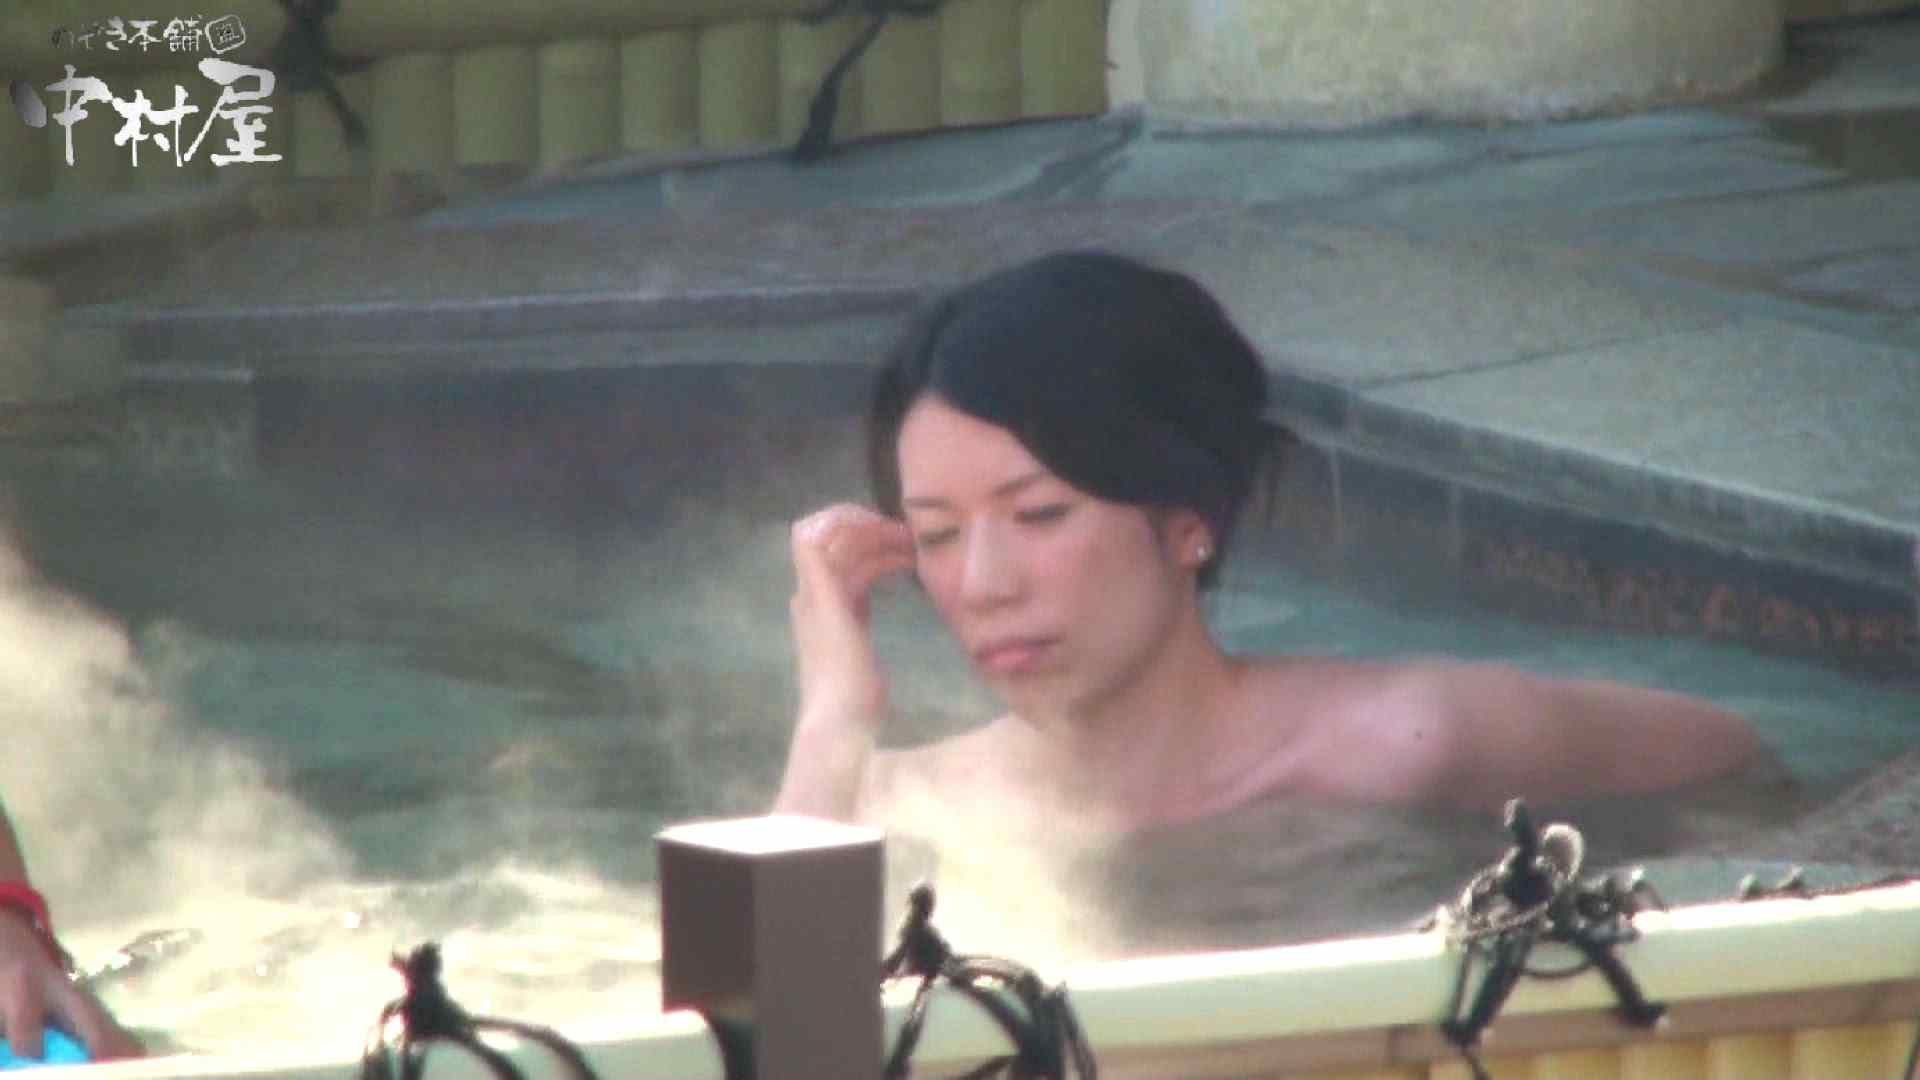 Aquaな露天風呂Vol.919 盗撮 おまんこ無修正動画無料 91連発 59